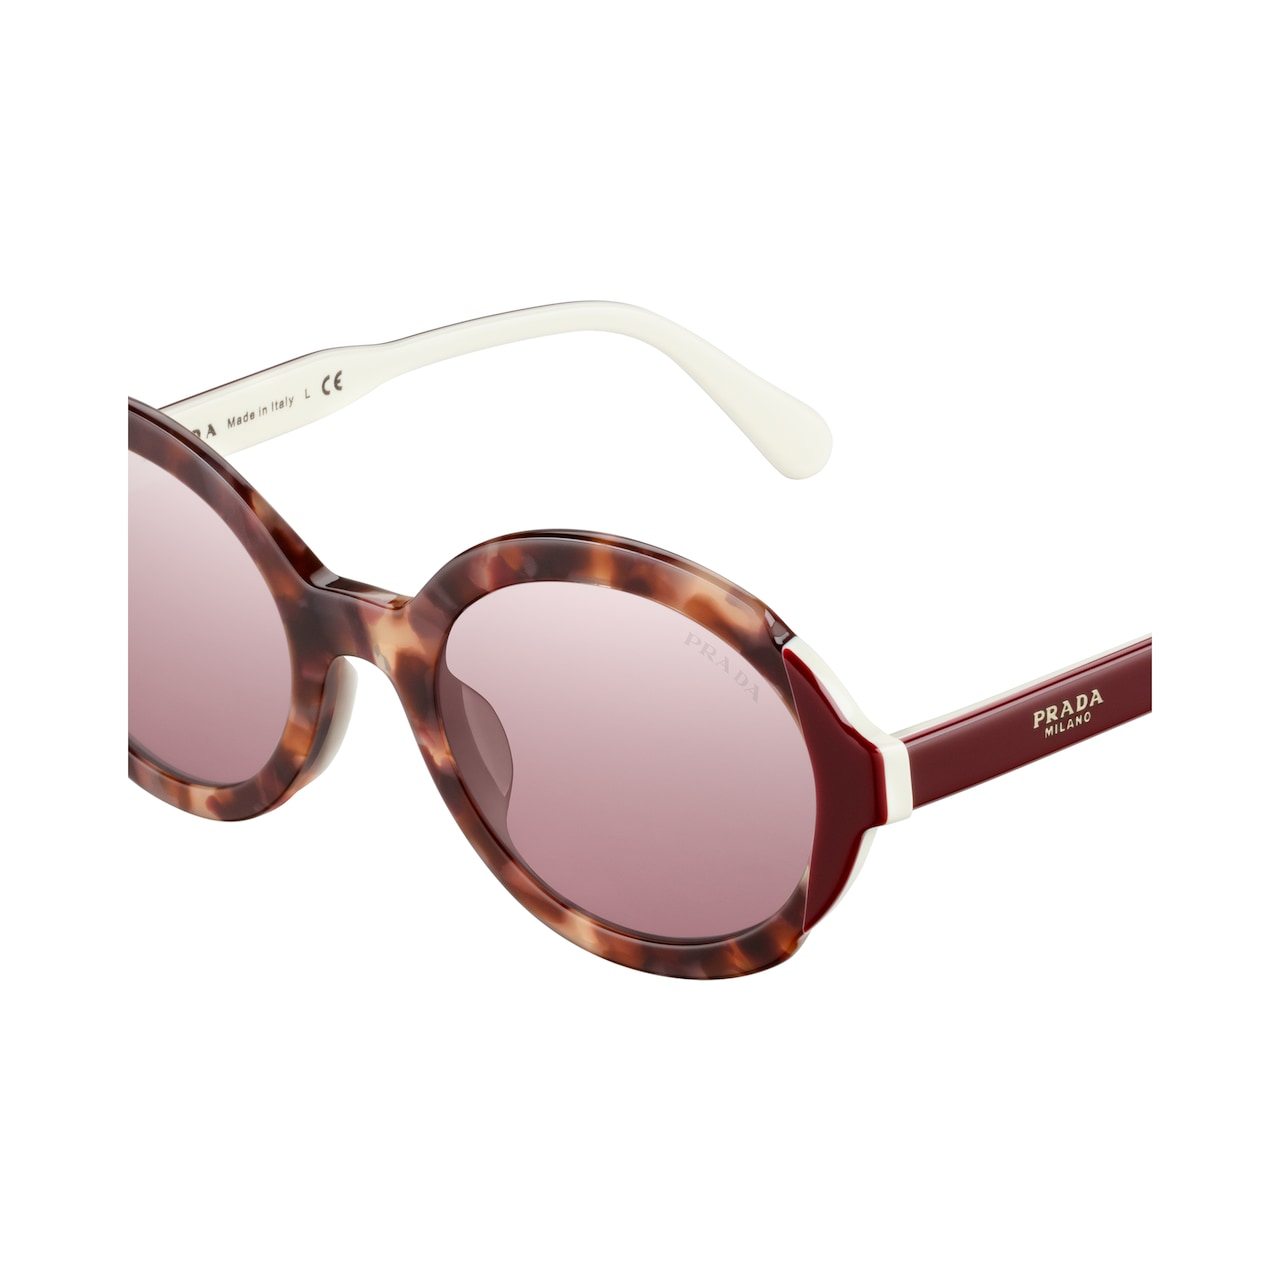 Prada Eyewear Collection Alternative Fit